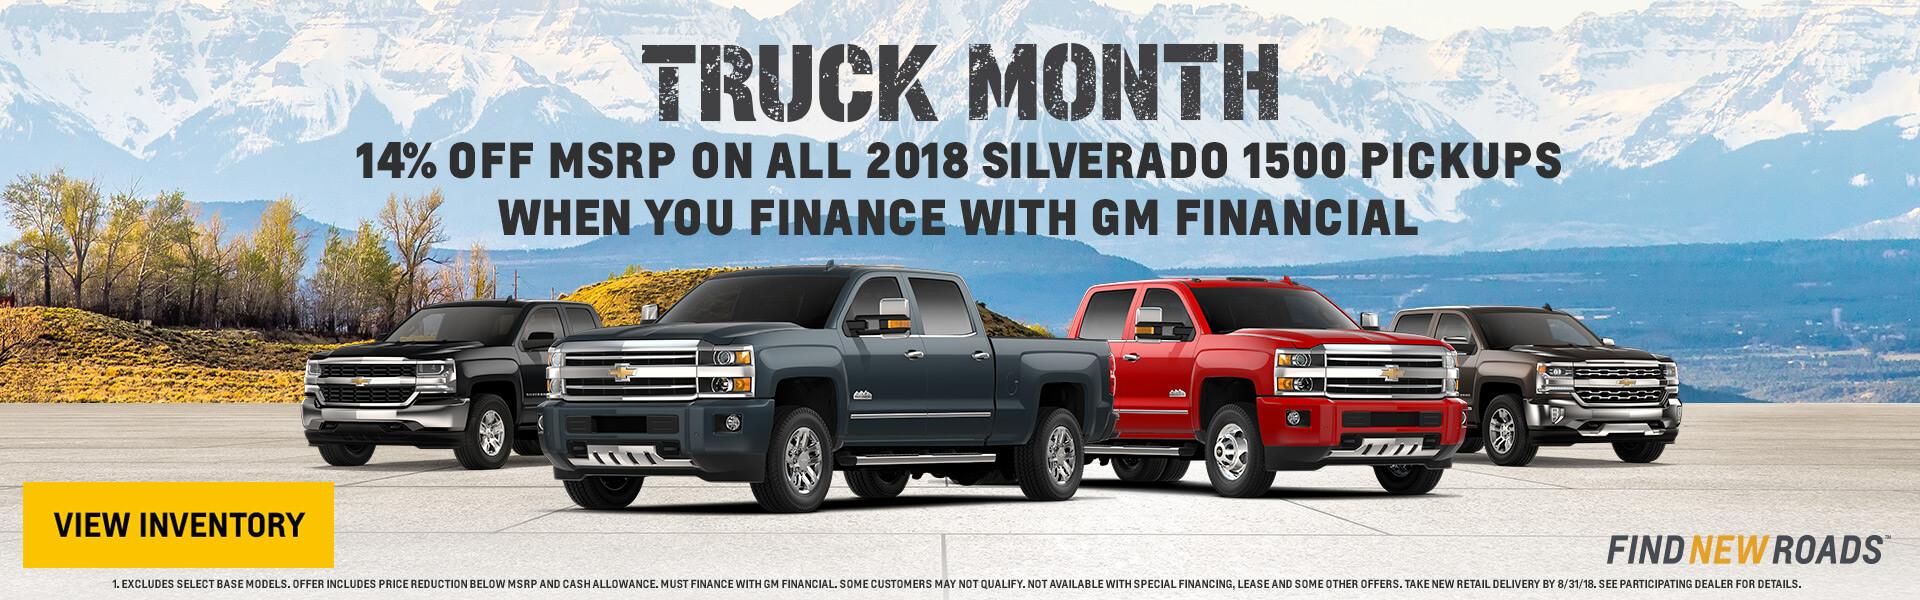 Truck Month Silverado 1500